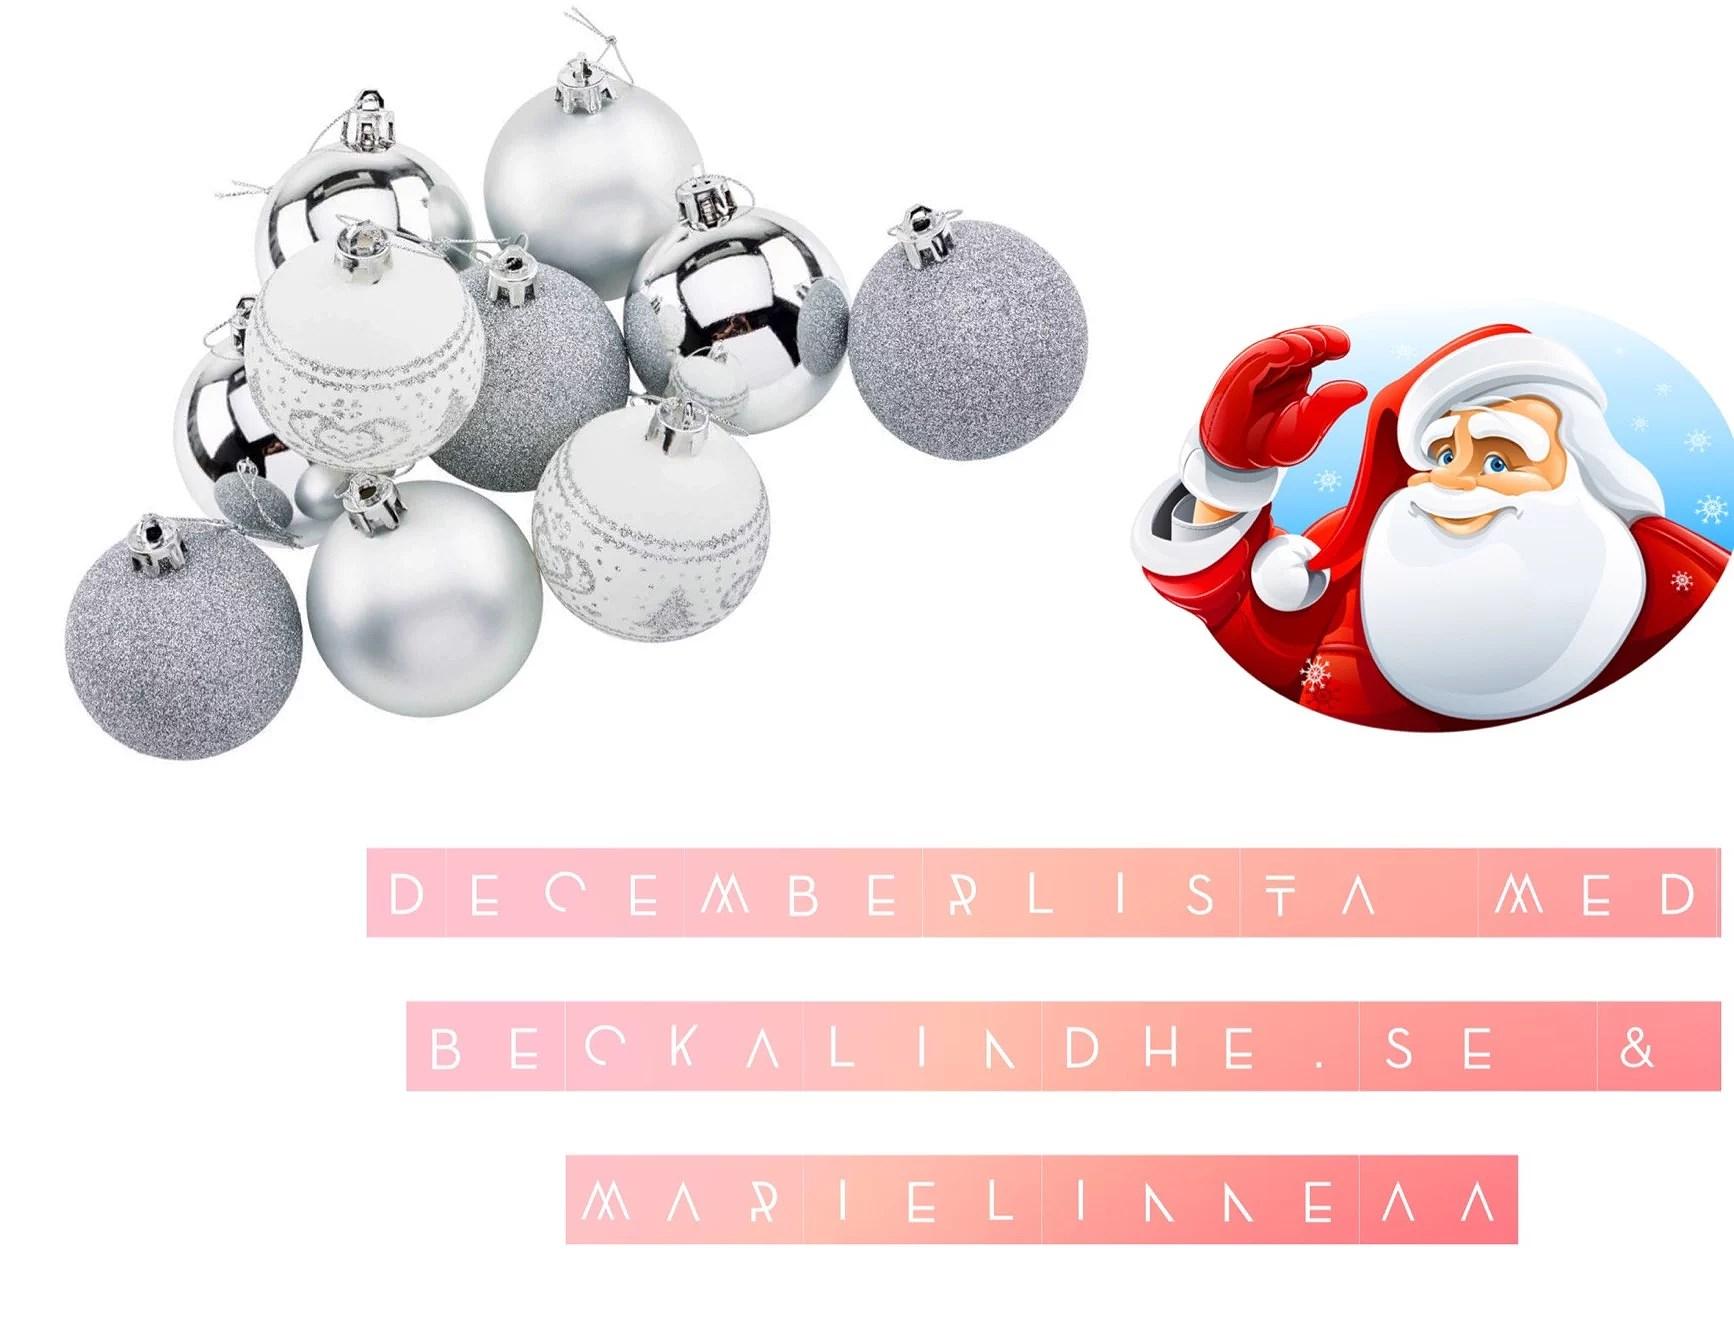 Decemberlista dag 3